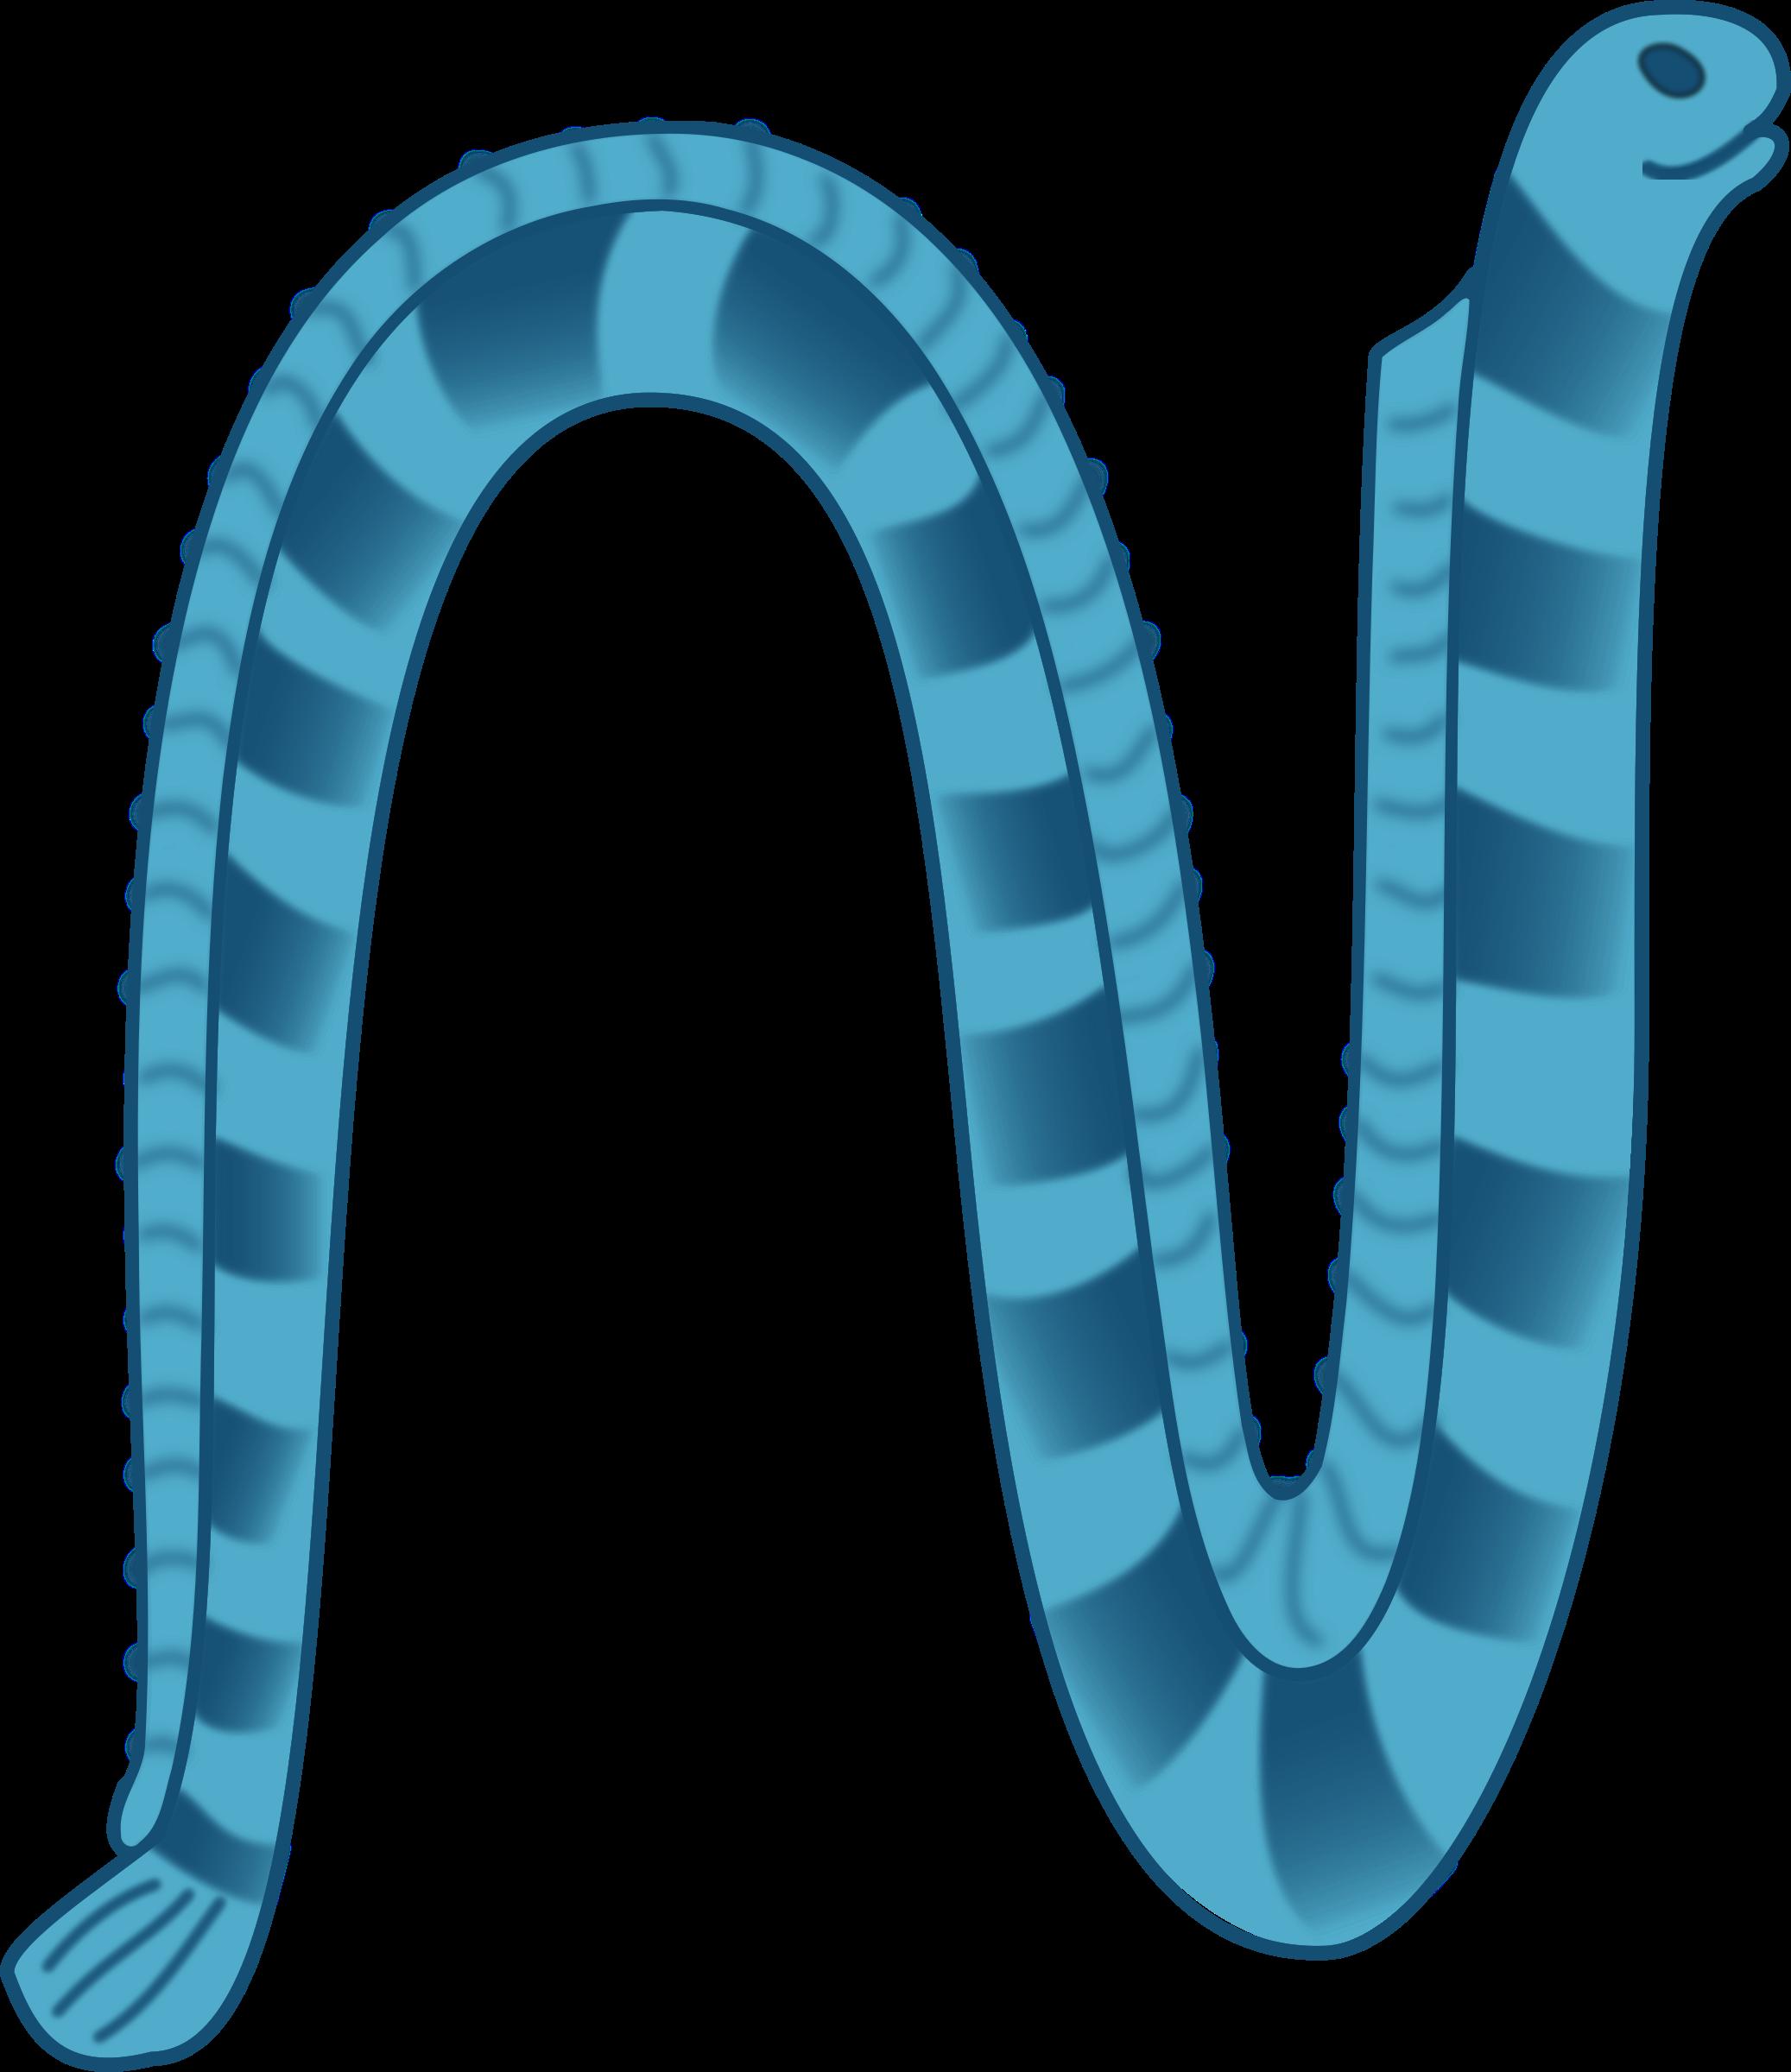 Reptile clipart sea snake #1